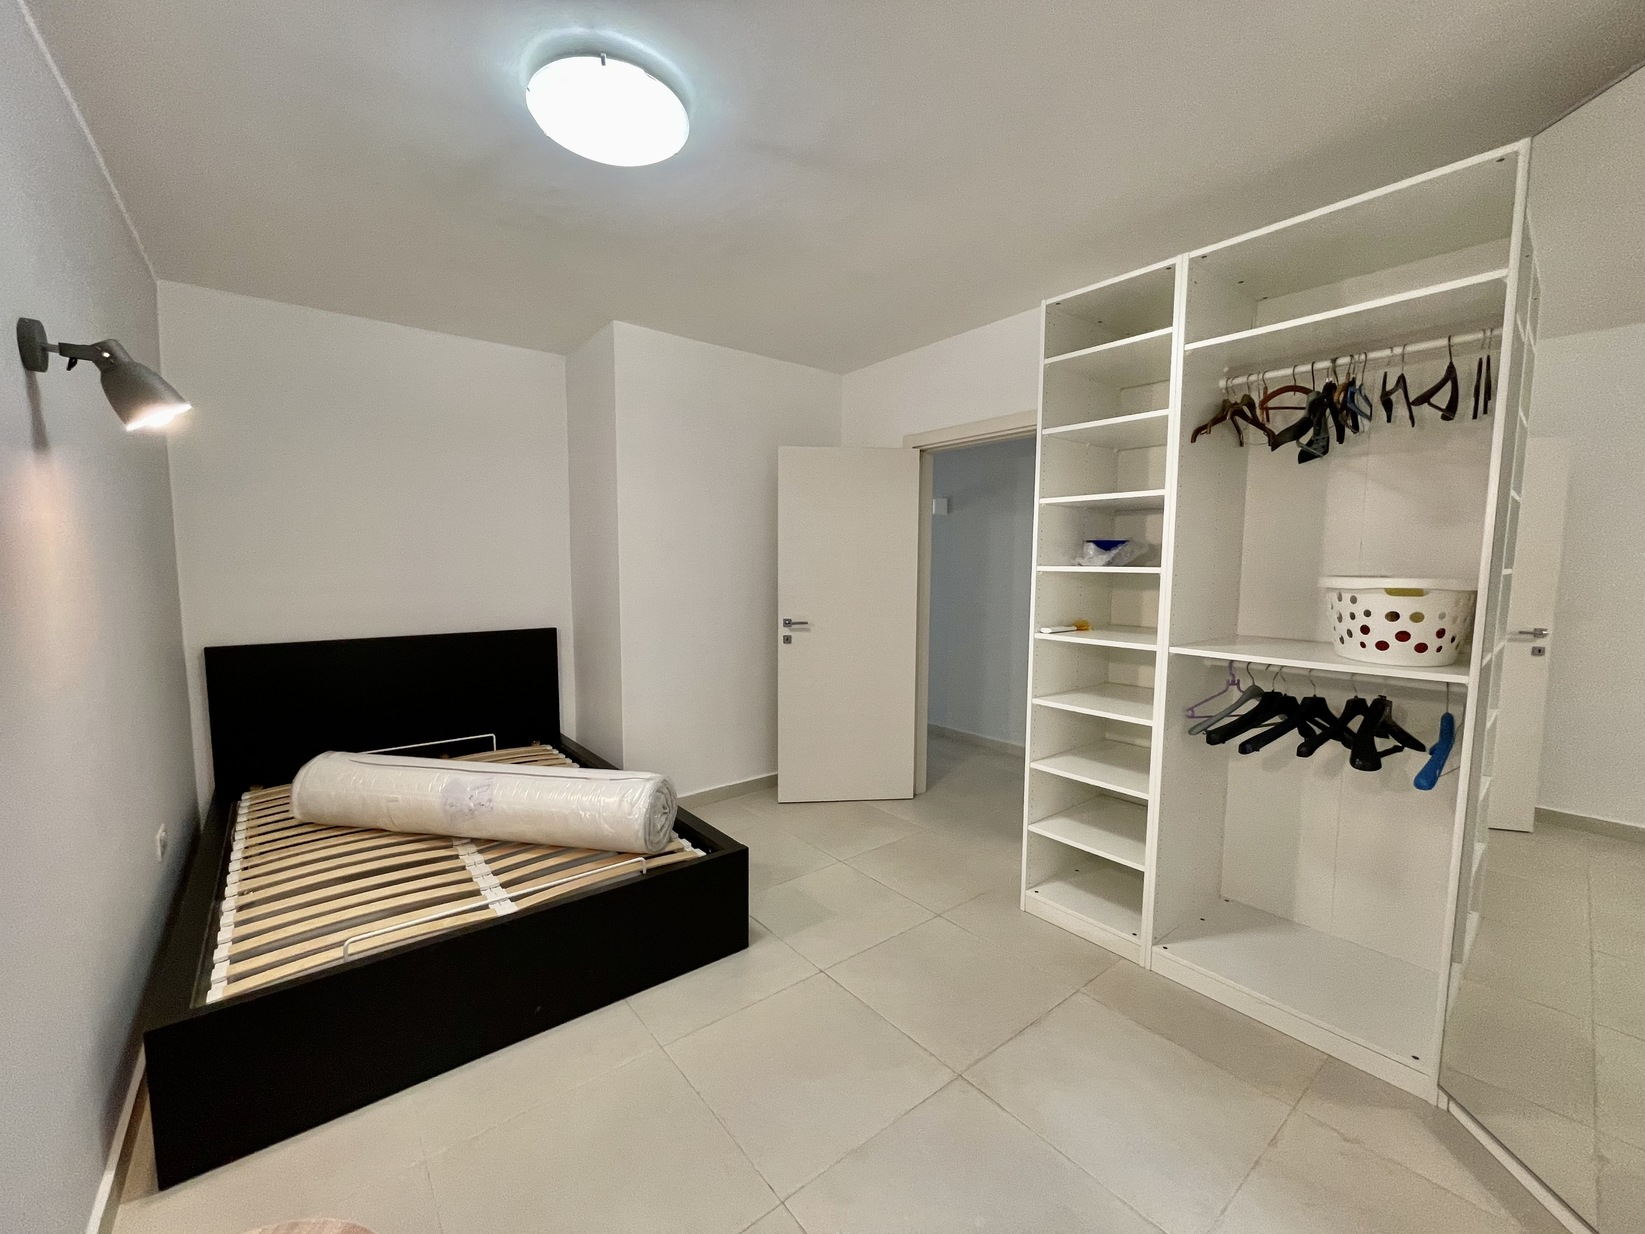 3 bed Apartment For Rent in Bahar Ic-Caghaq, Bahar ic-Caghaq - thumb 12